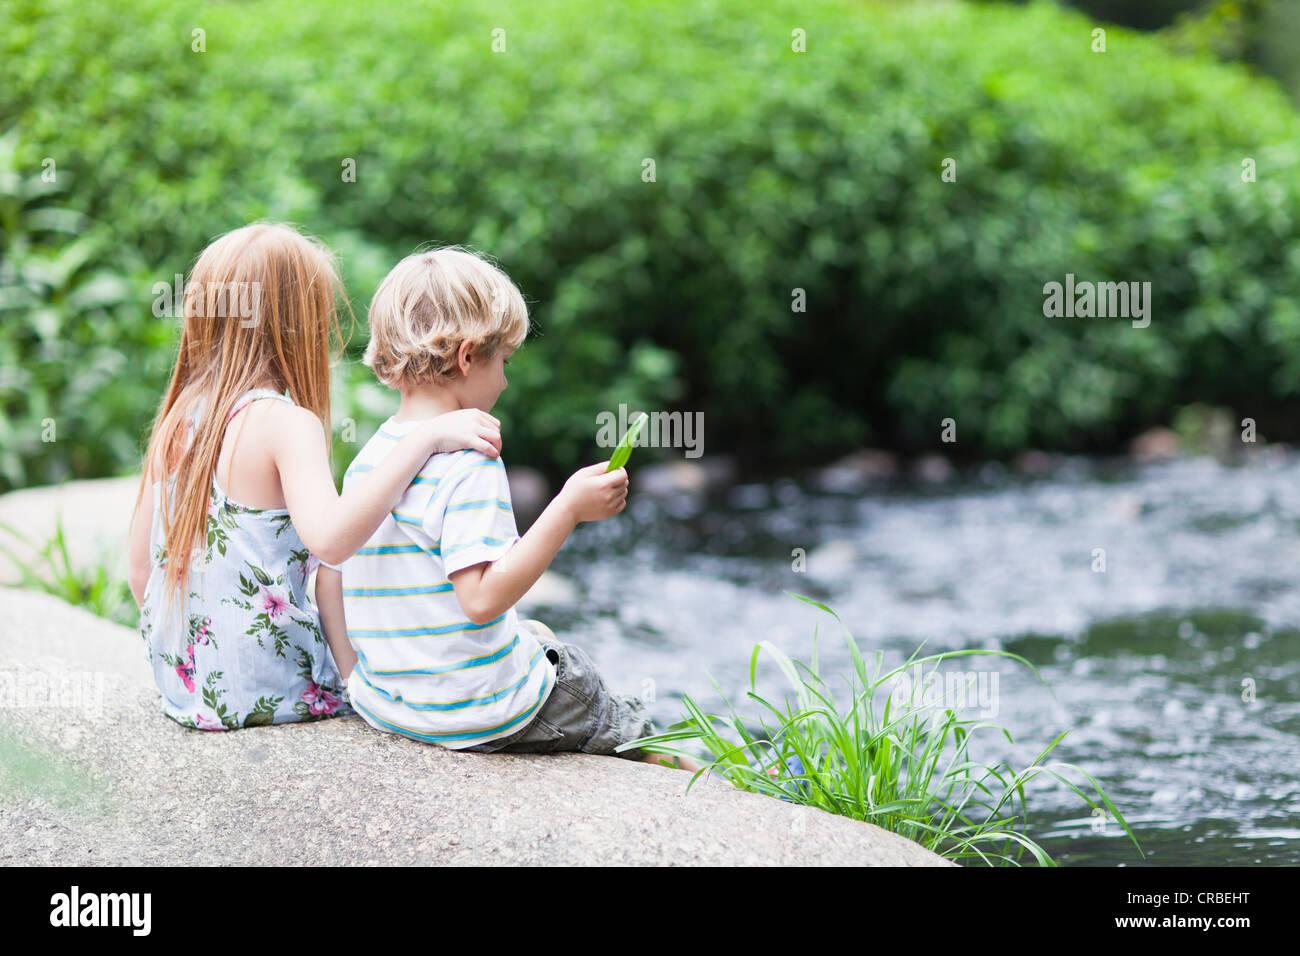 Children sitting on rock together - Stock Image